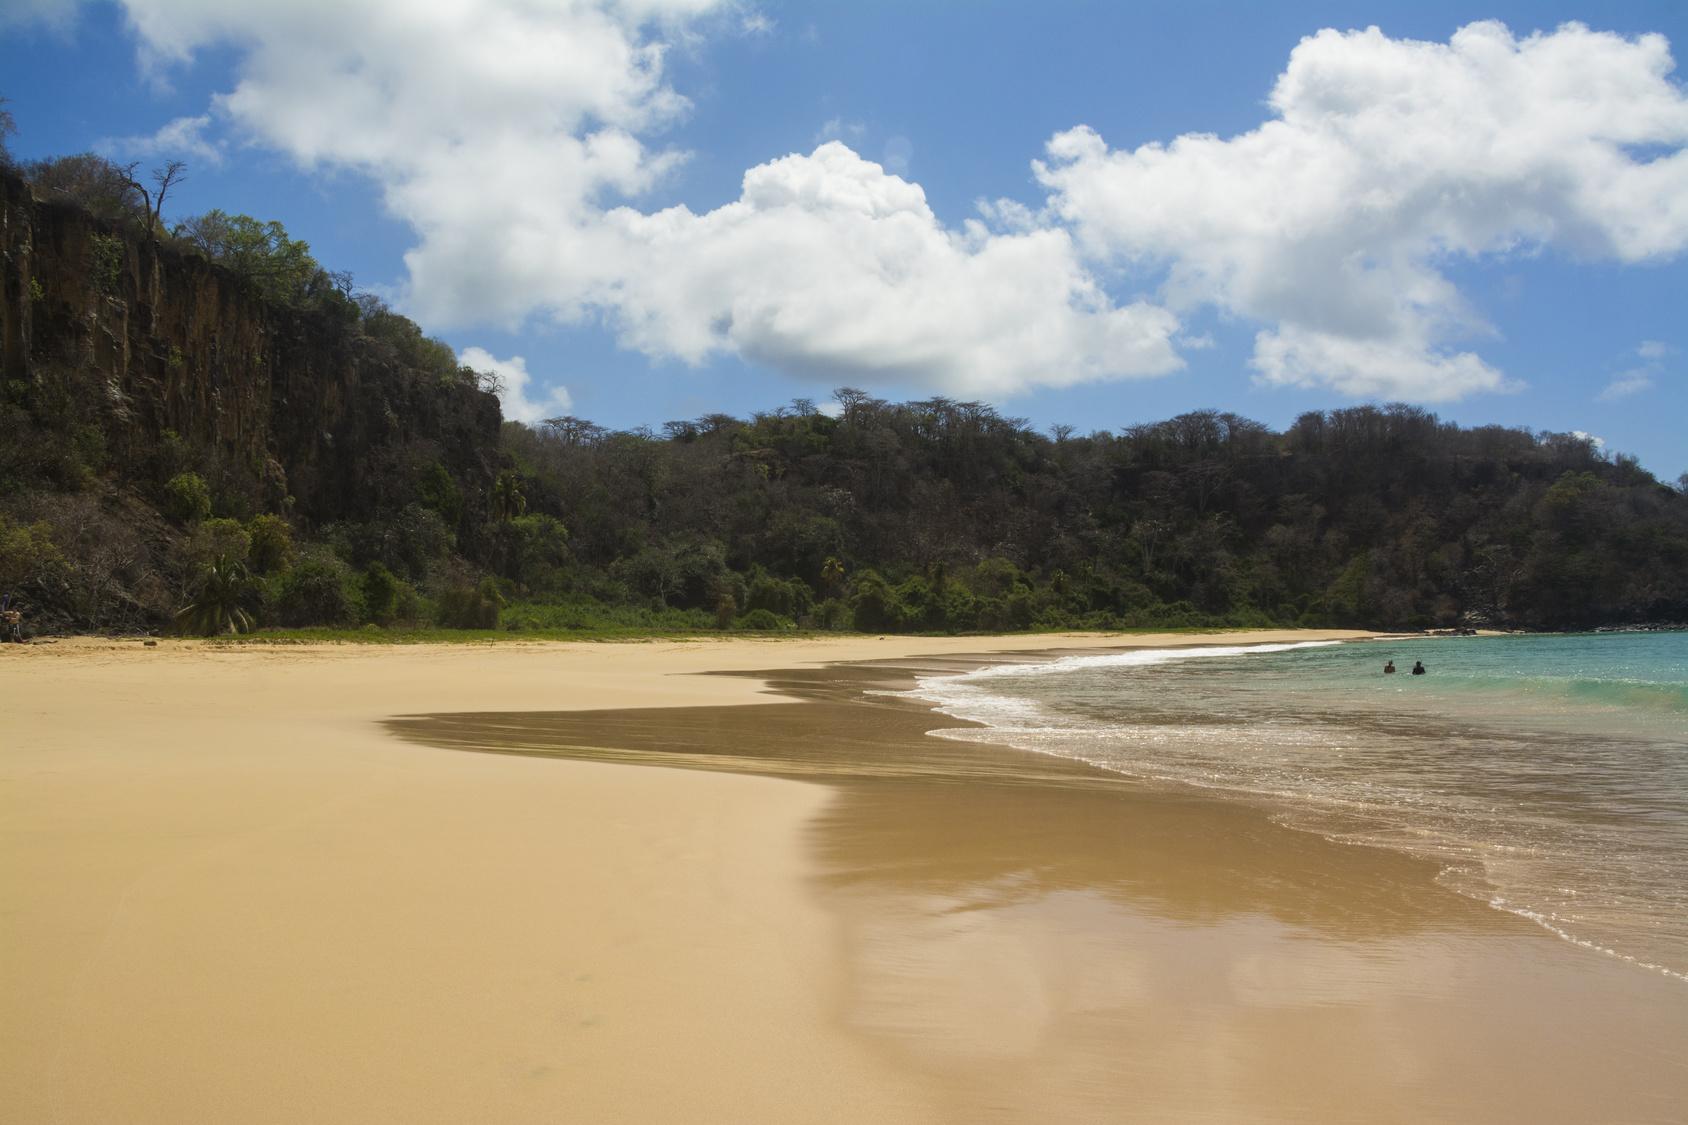 Legszebb strandok 2019 - Baia do Sancho, Brazília